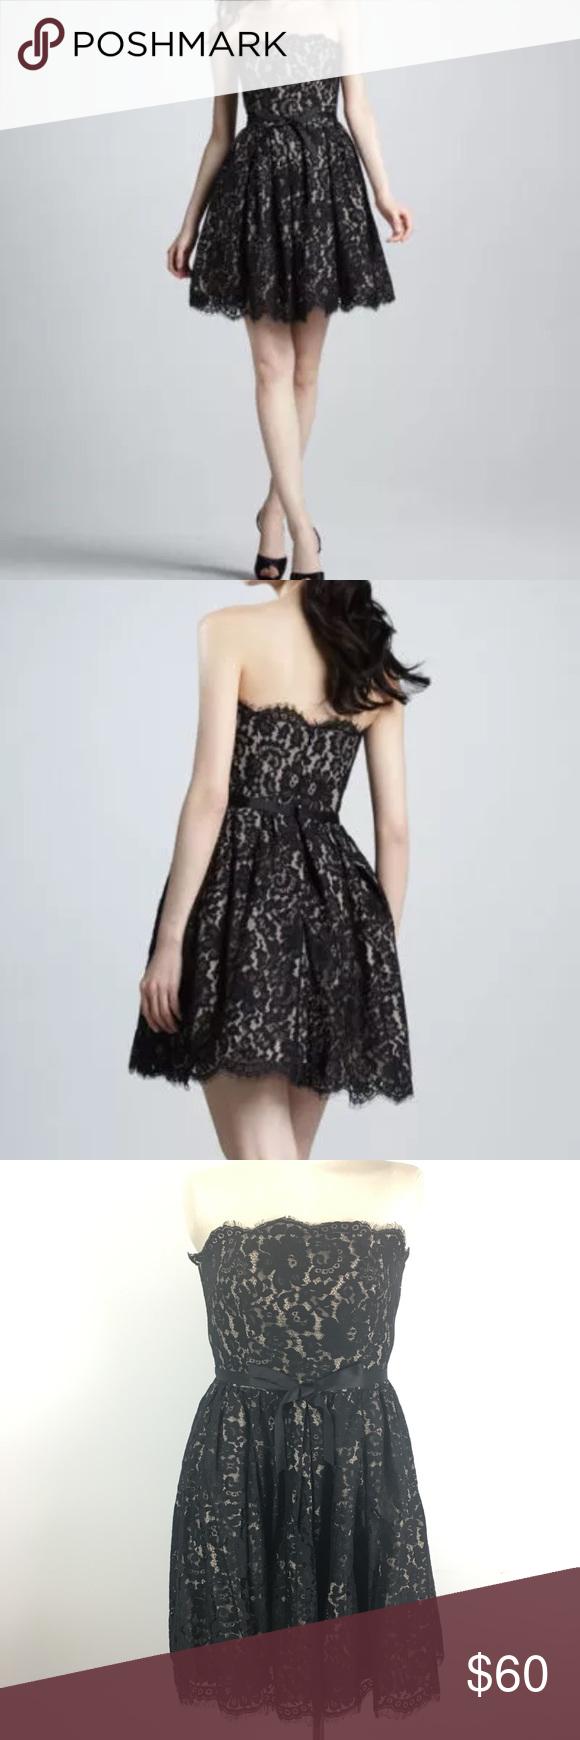 Robert Rodriguez Black Lace Dress 8 sleeveless Good